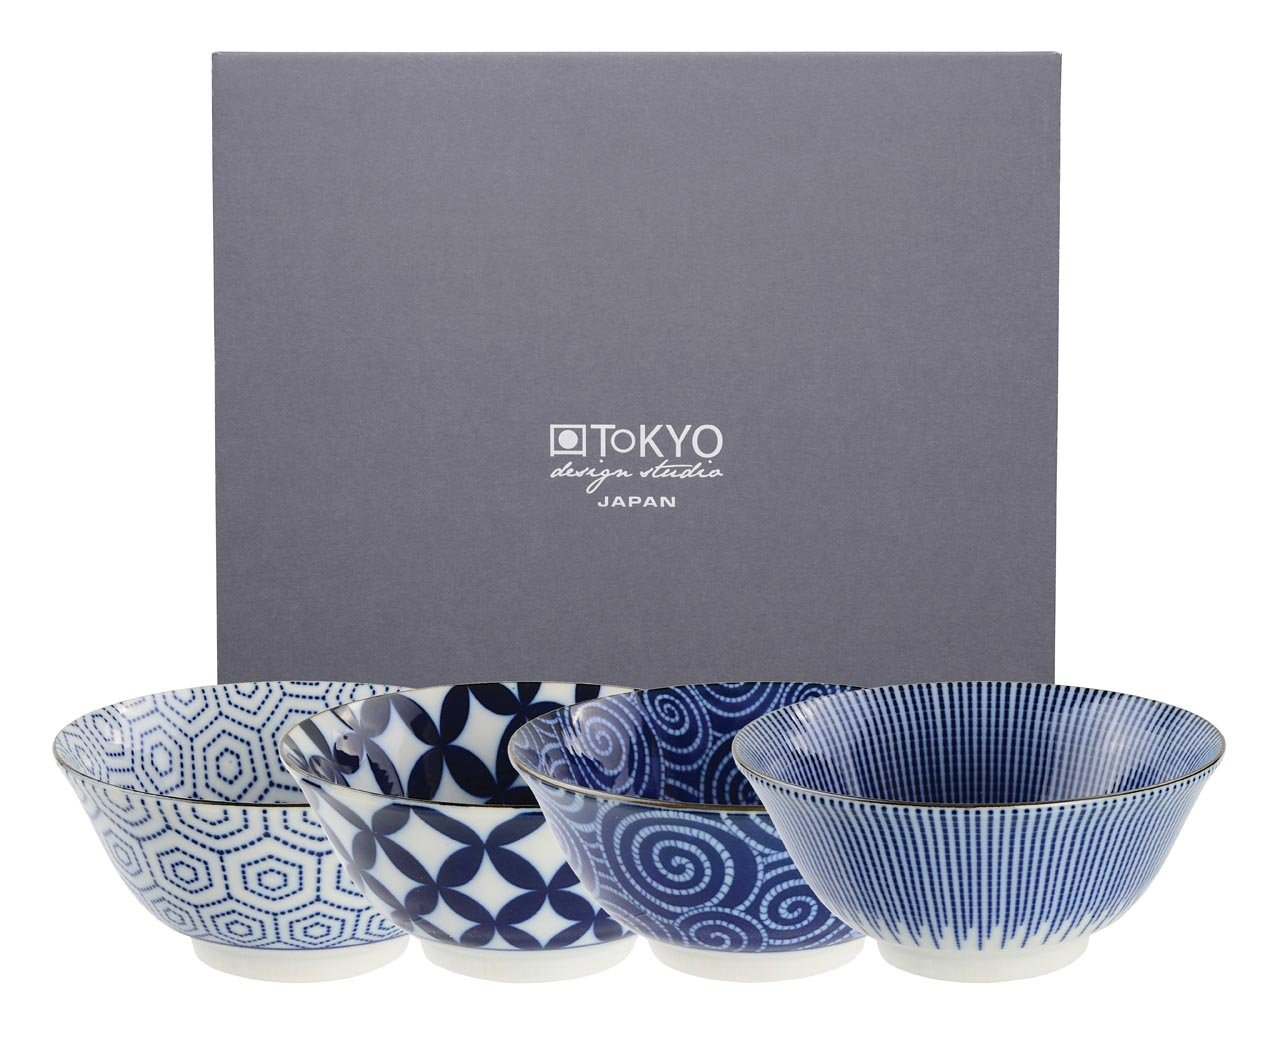 Tokyo Design Studio, Floral Blue, 4 Schalen Set , 4-tlg., Ø 14.8 cm, Porzellan aus Japan Ø 14.8 cm